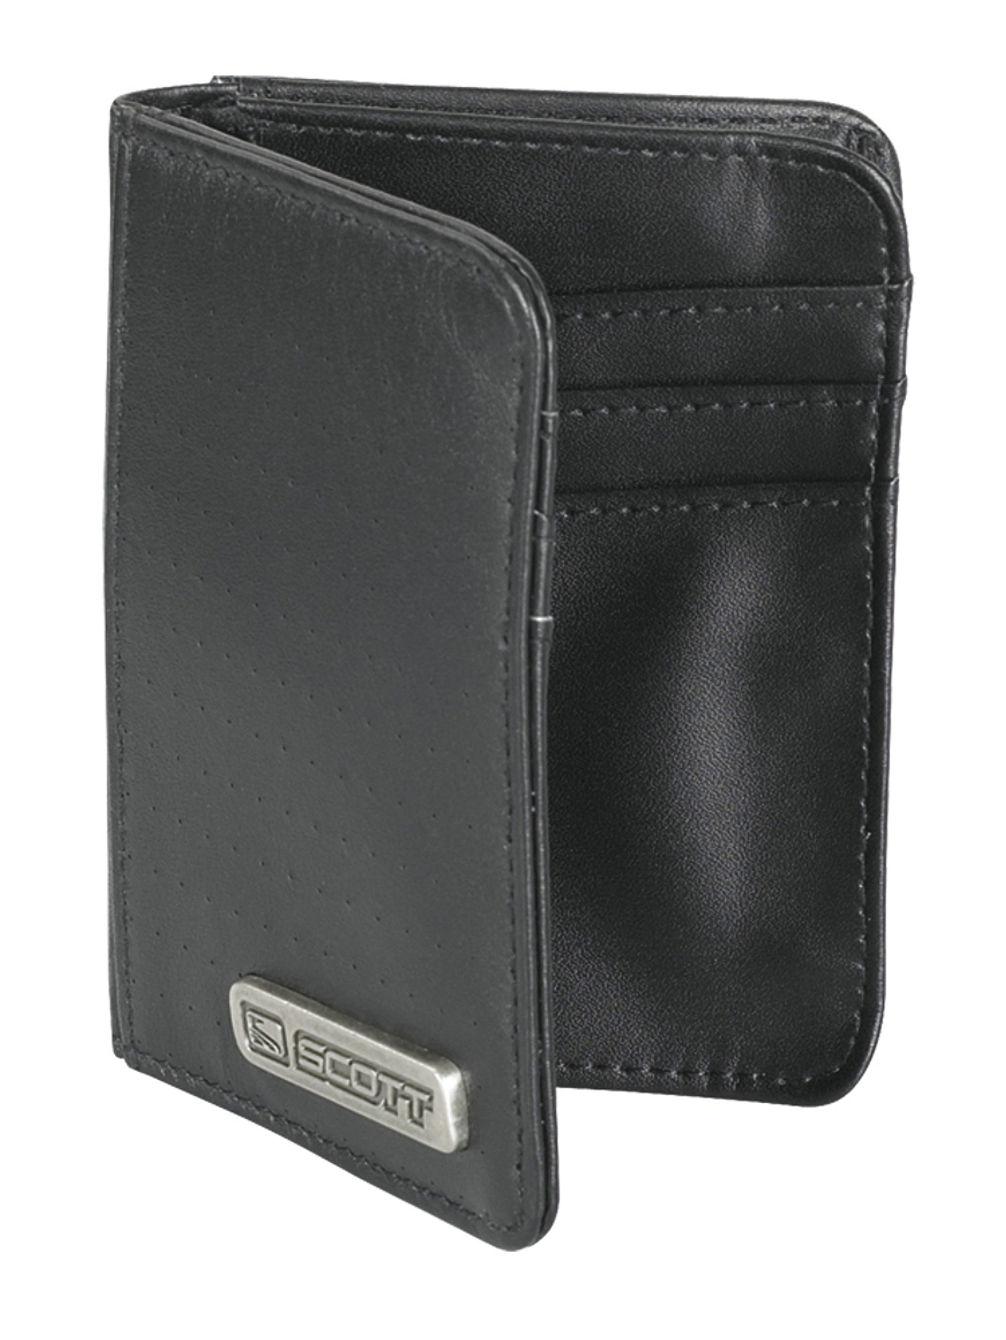 cc-wallet